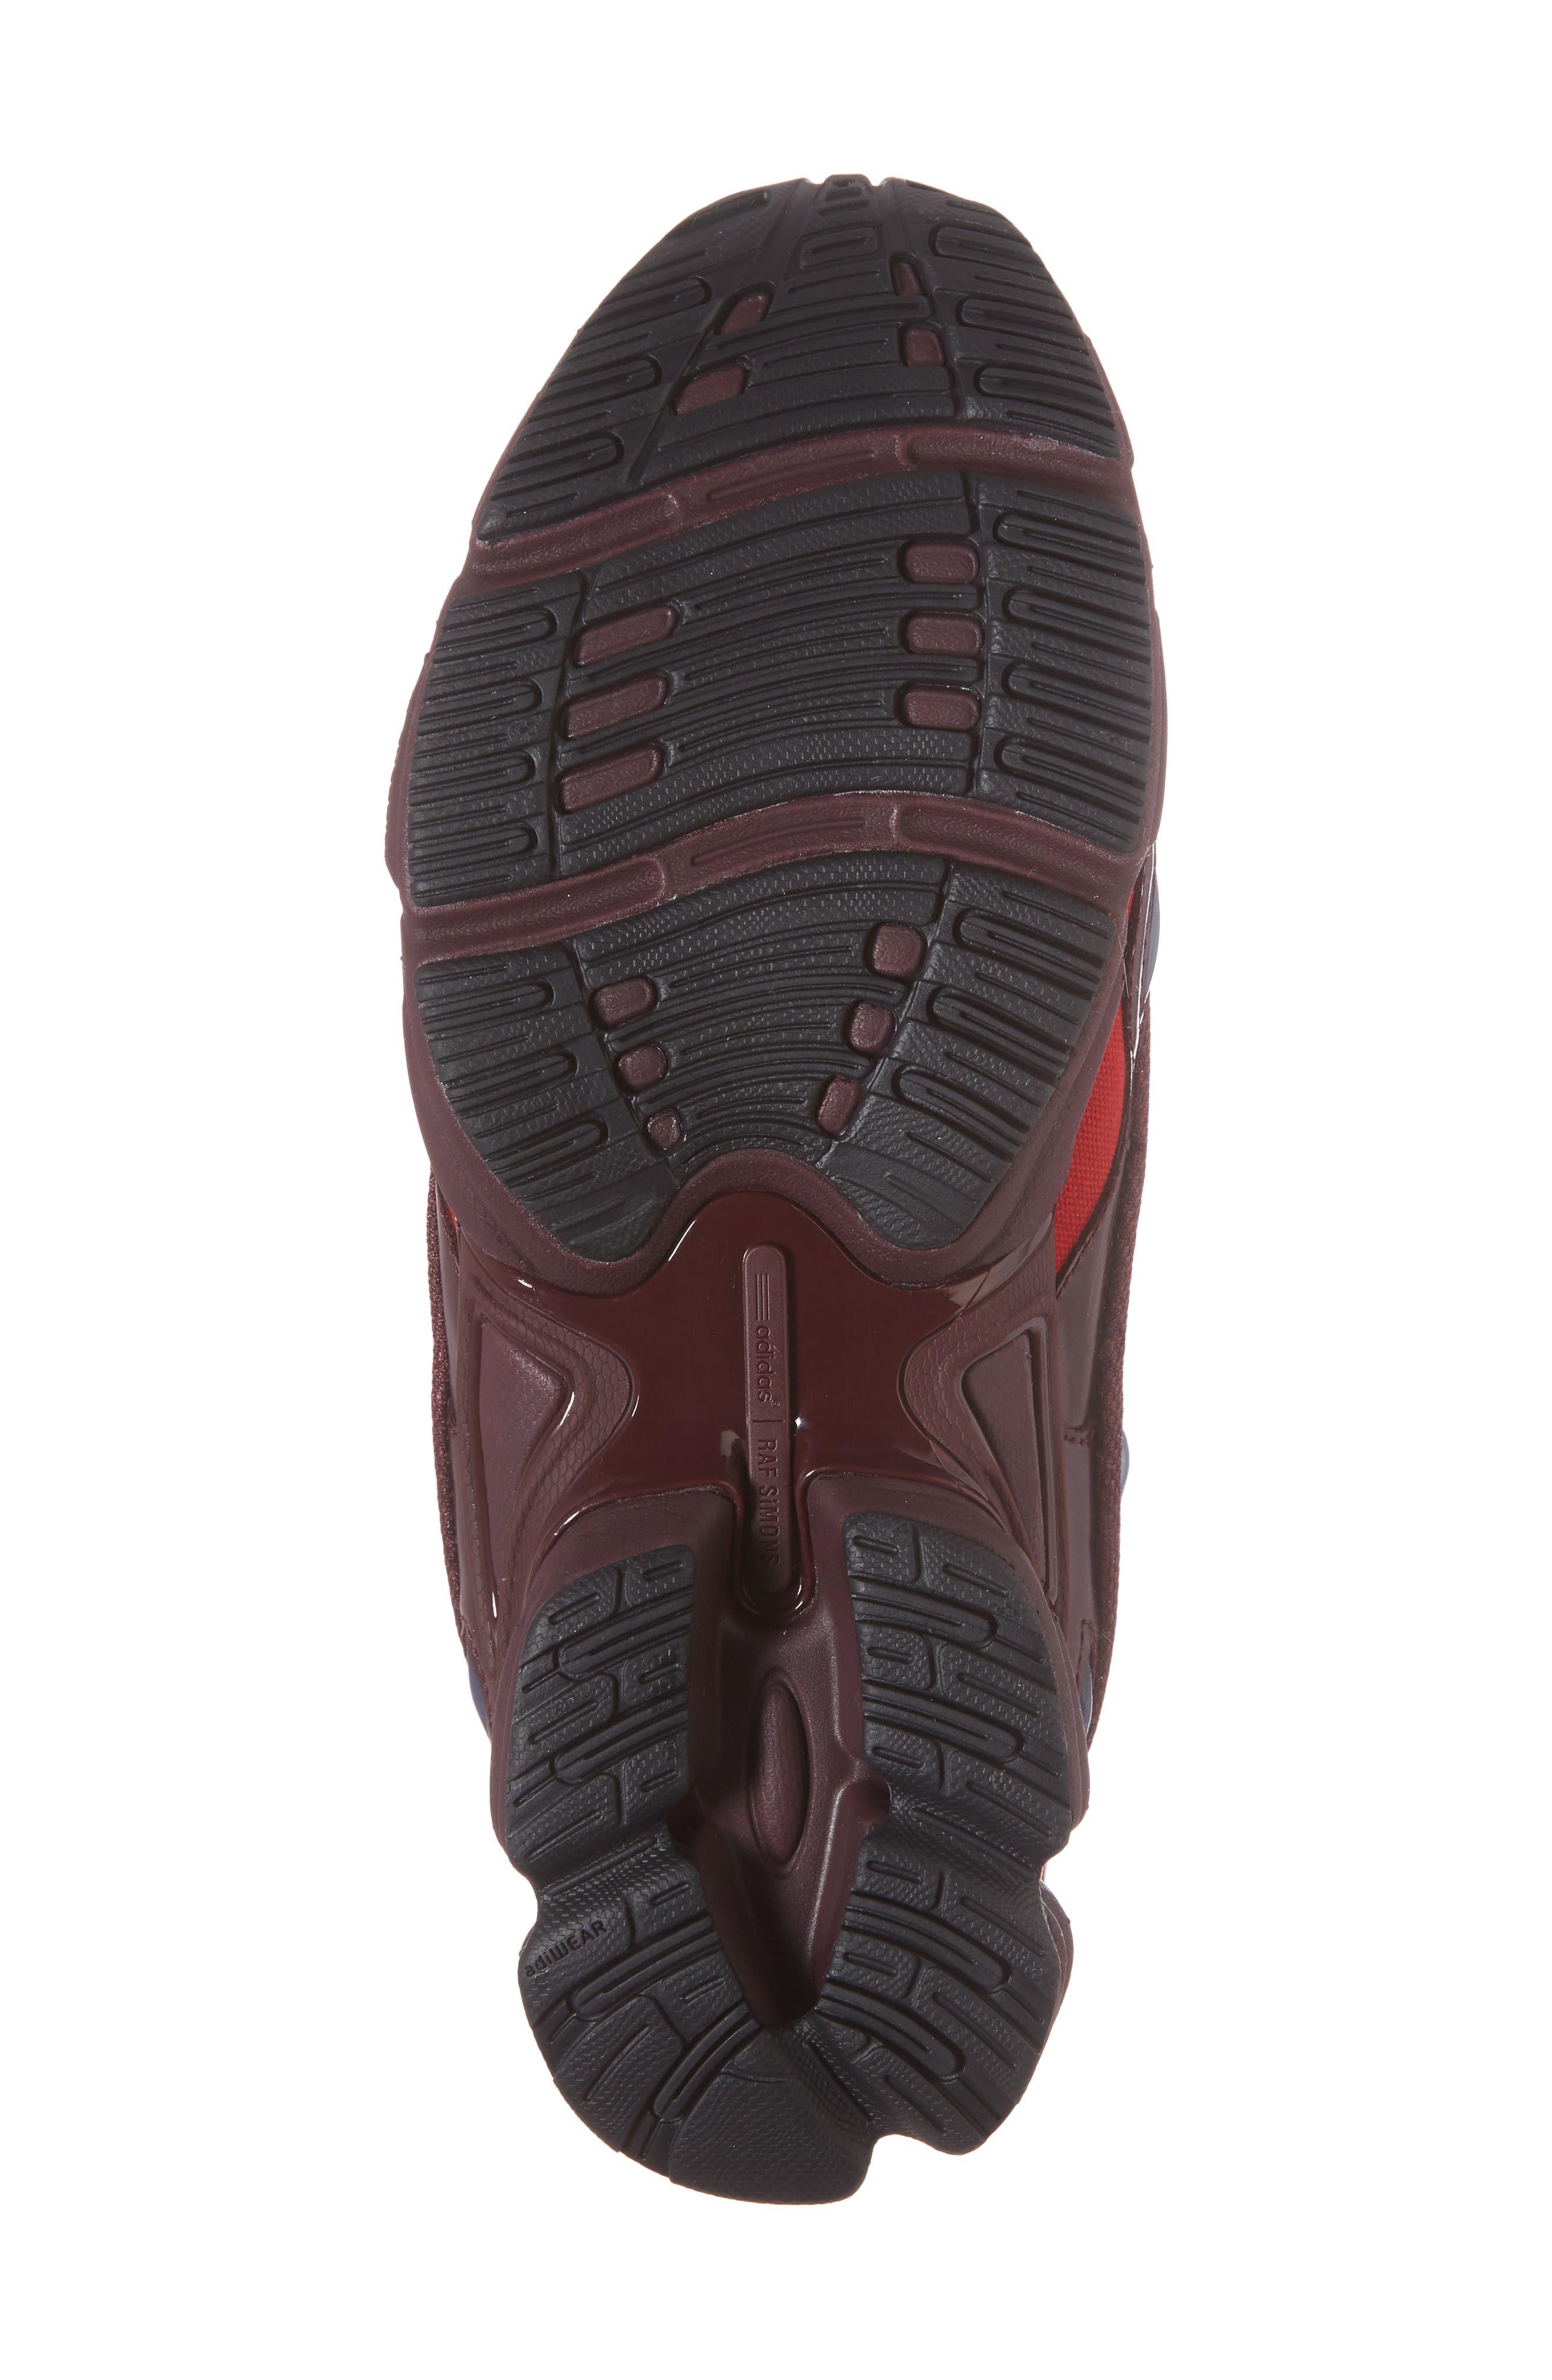 adidas by Raf Simons Ozweego III Sneaker,                             Alternate thumbnail 6, color,                             Burgundy/ Maroon/ Scarlet